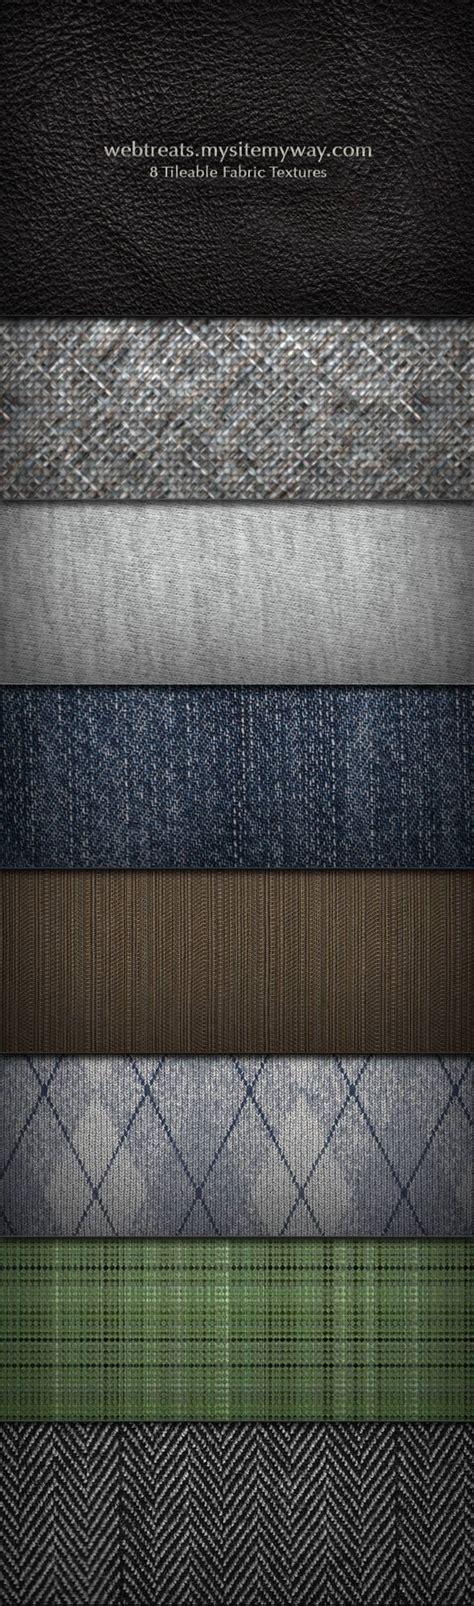 pattern fabric photoshop fabric texture and pattern set by webtreatsetc on deviantart